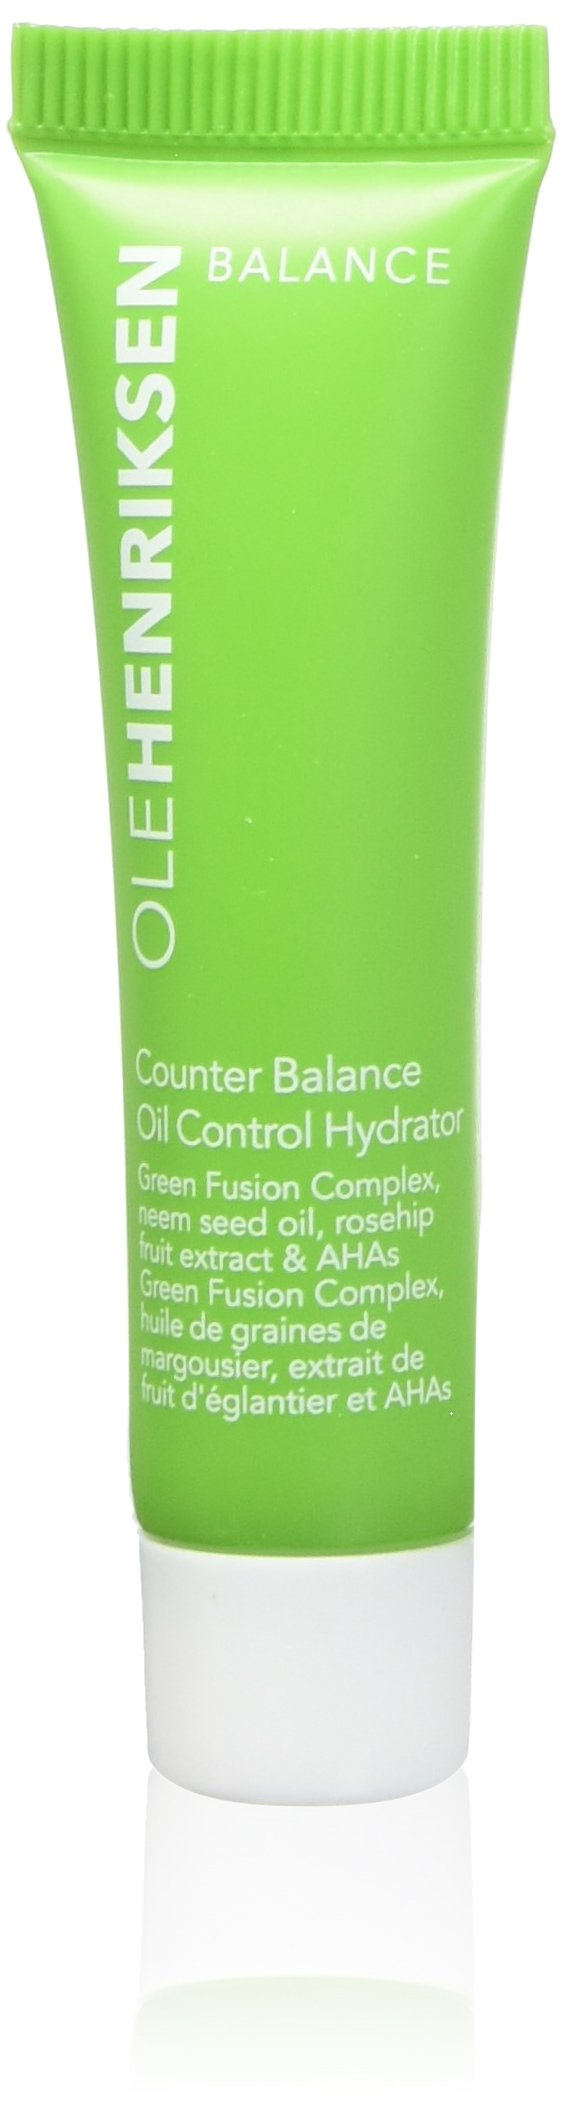 OLEHENRIKSEN Ole Henriksen Counter Balance Oil Control Hydrator 0.25 oz